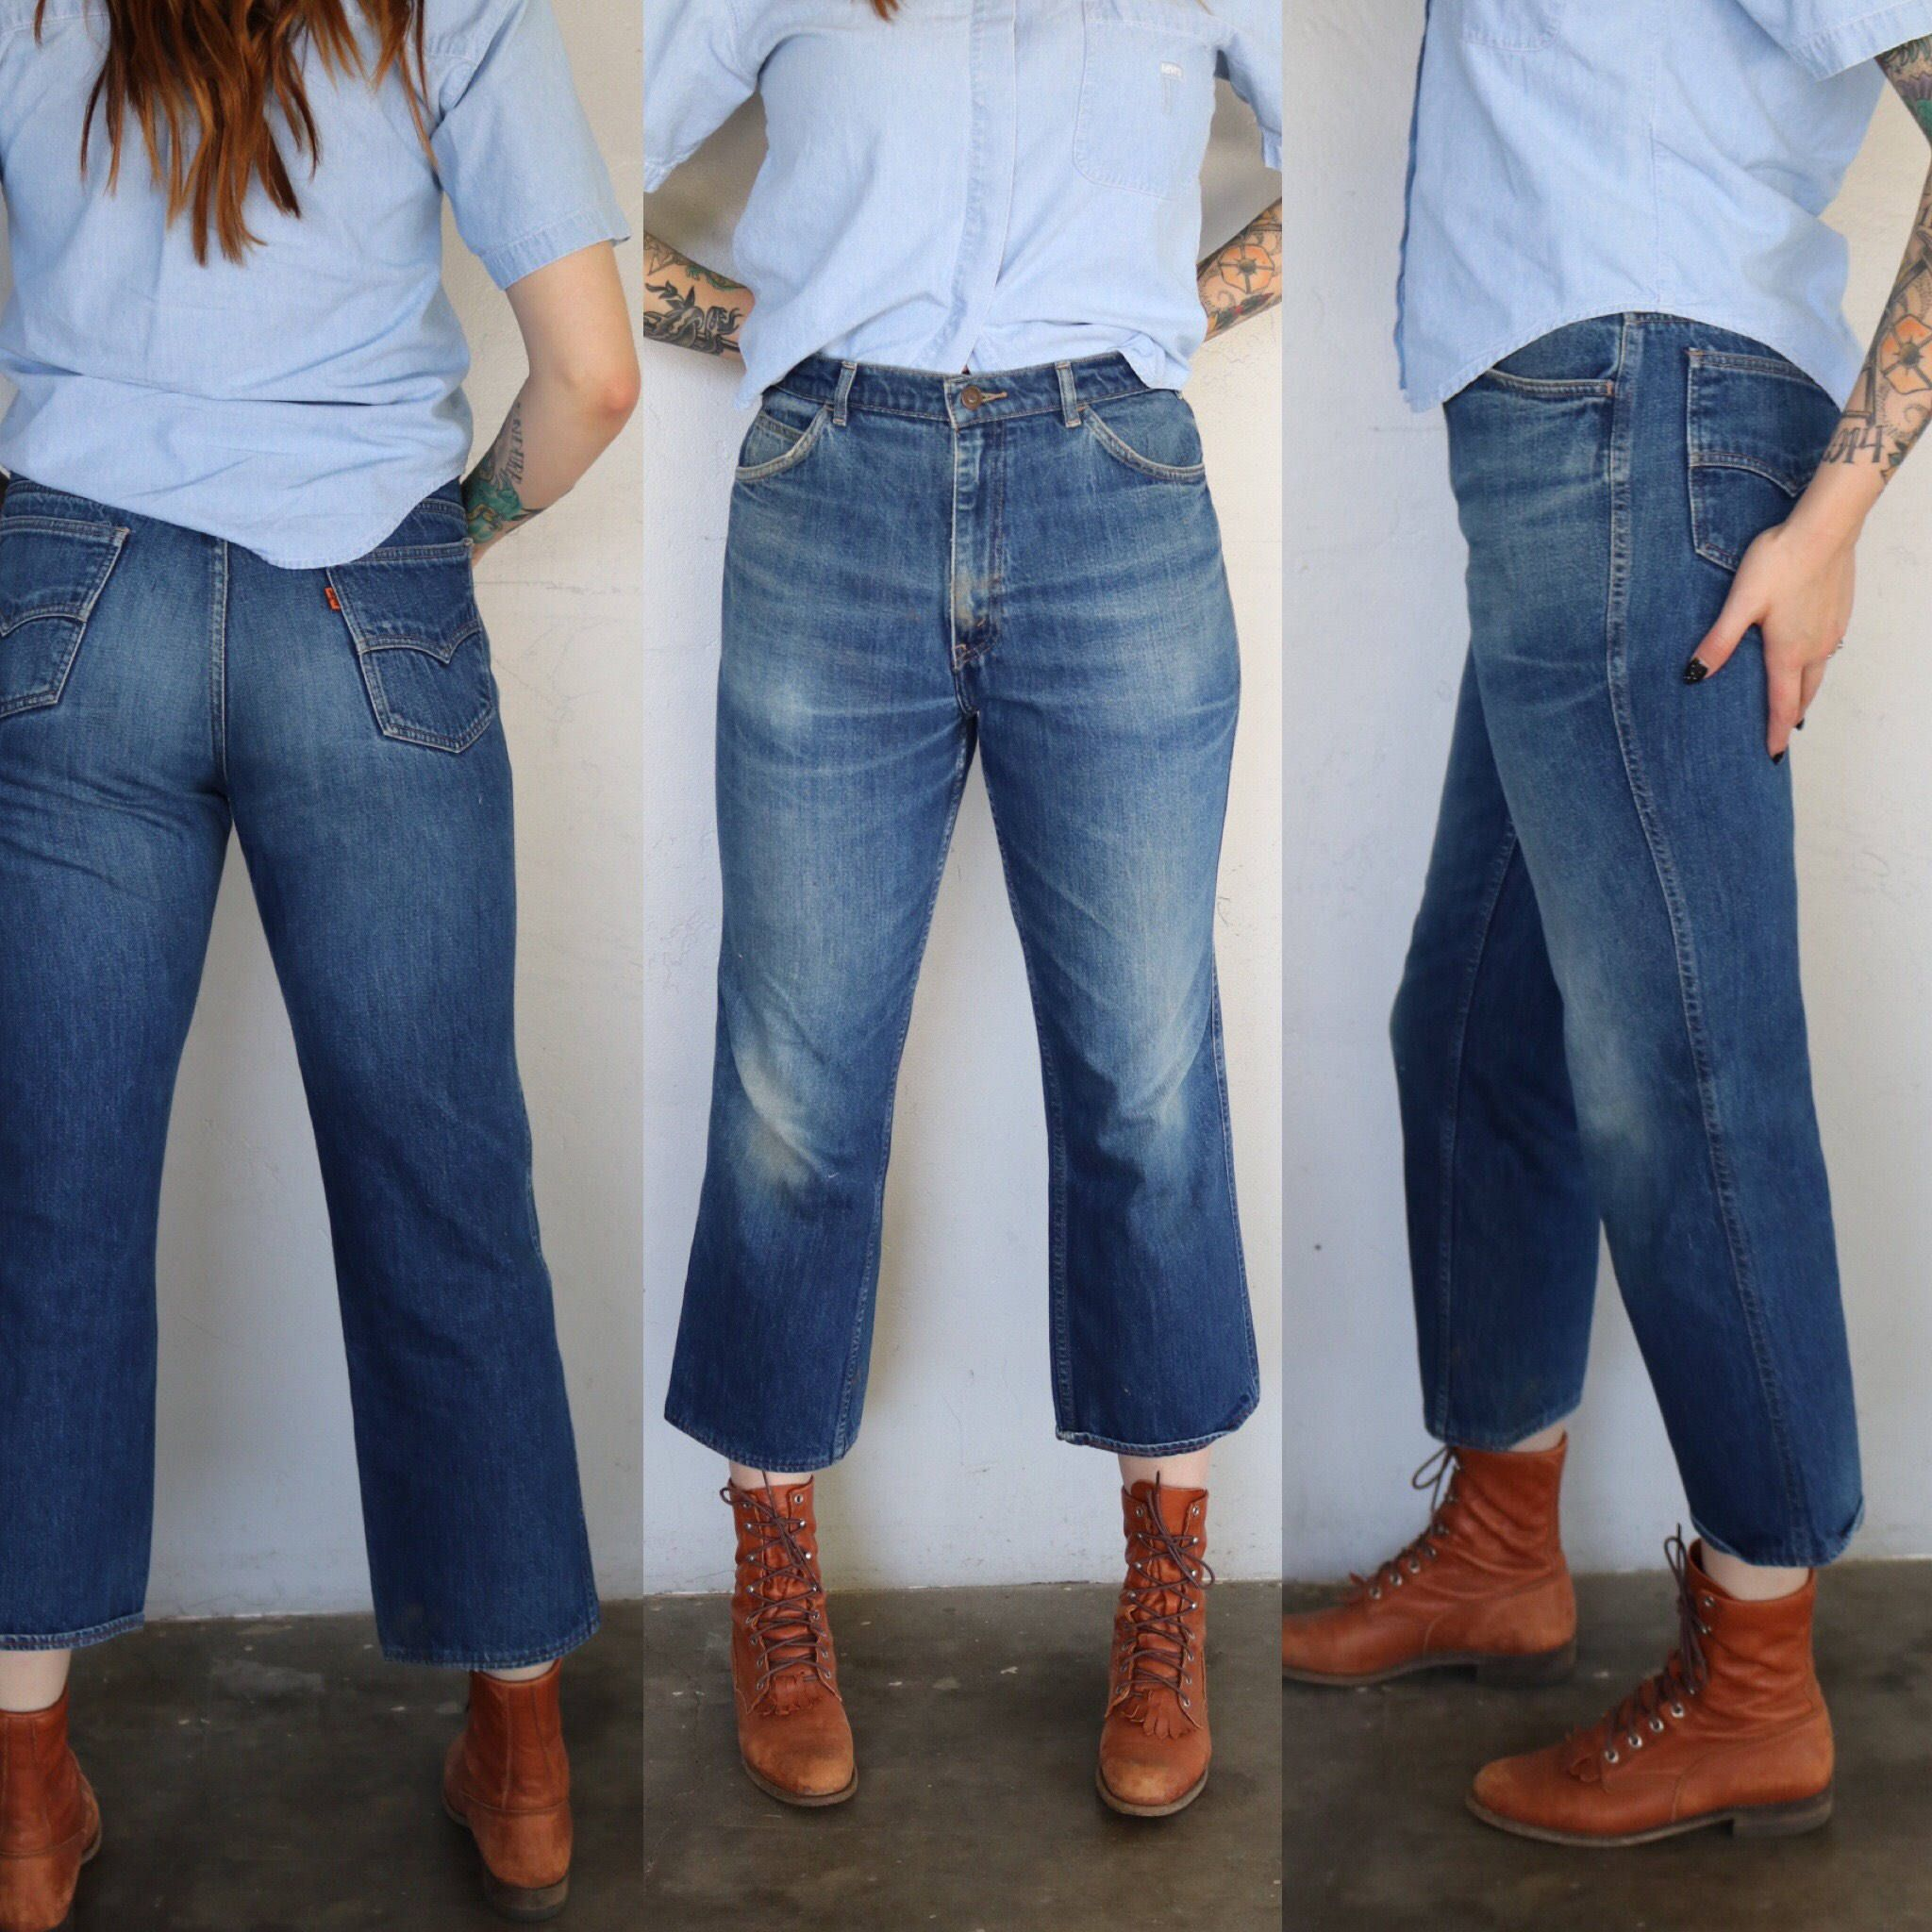 waist dolap chart jag co comfort comforter jeans size magnetband